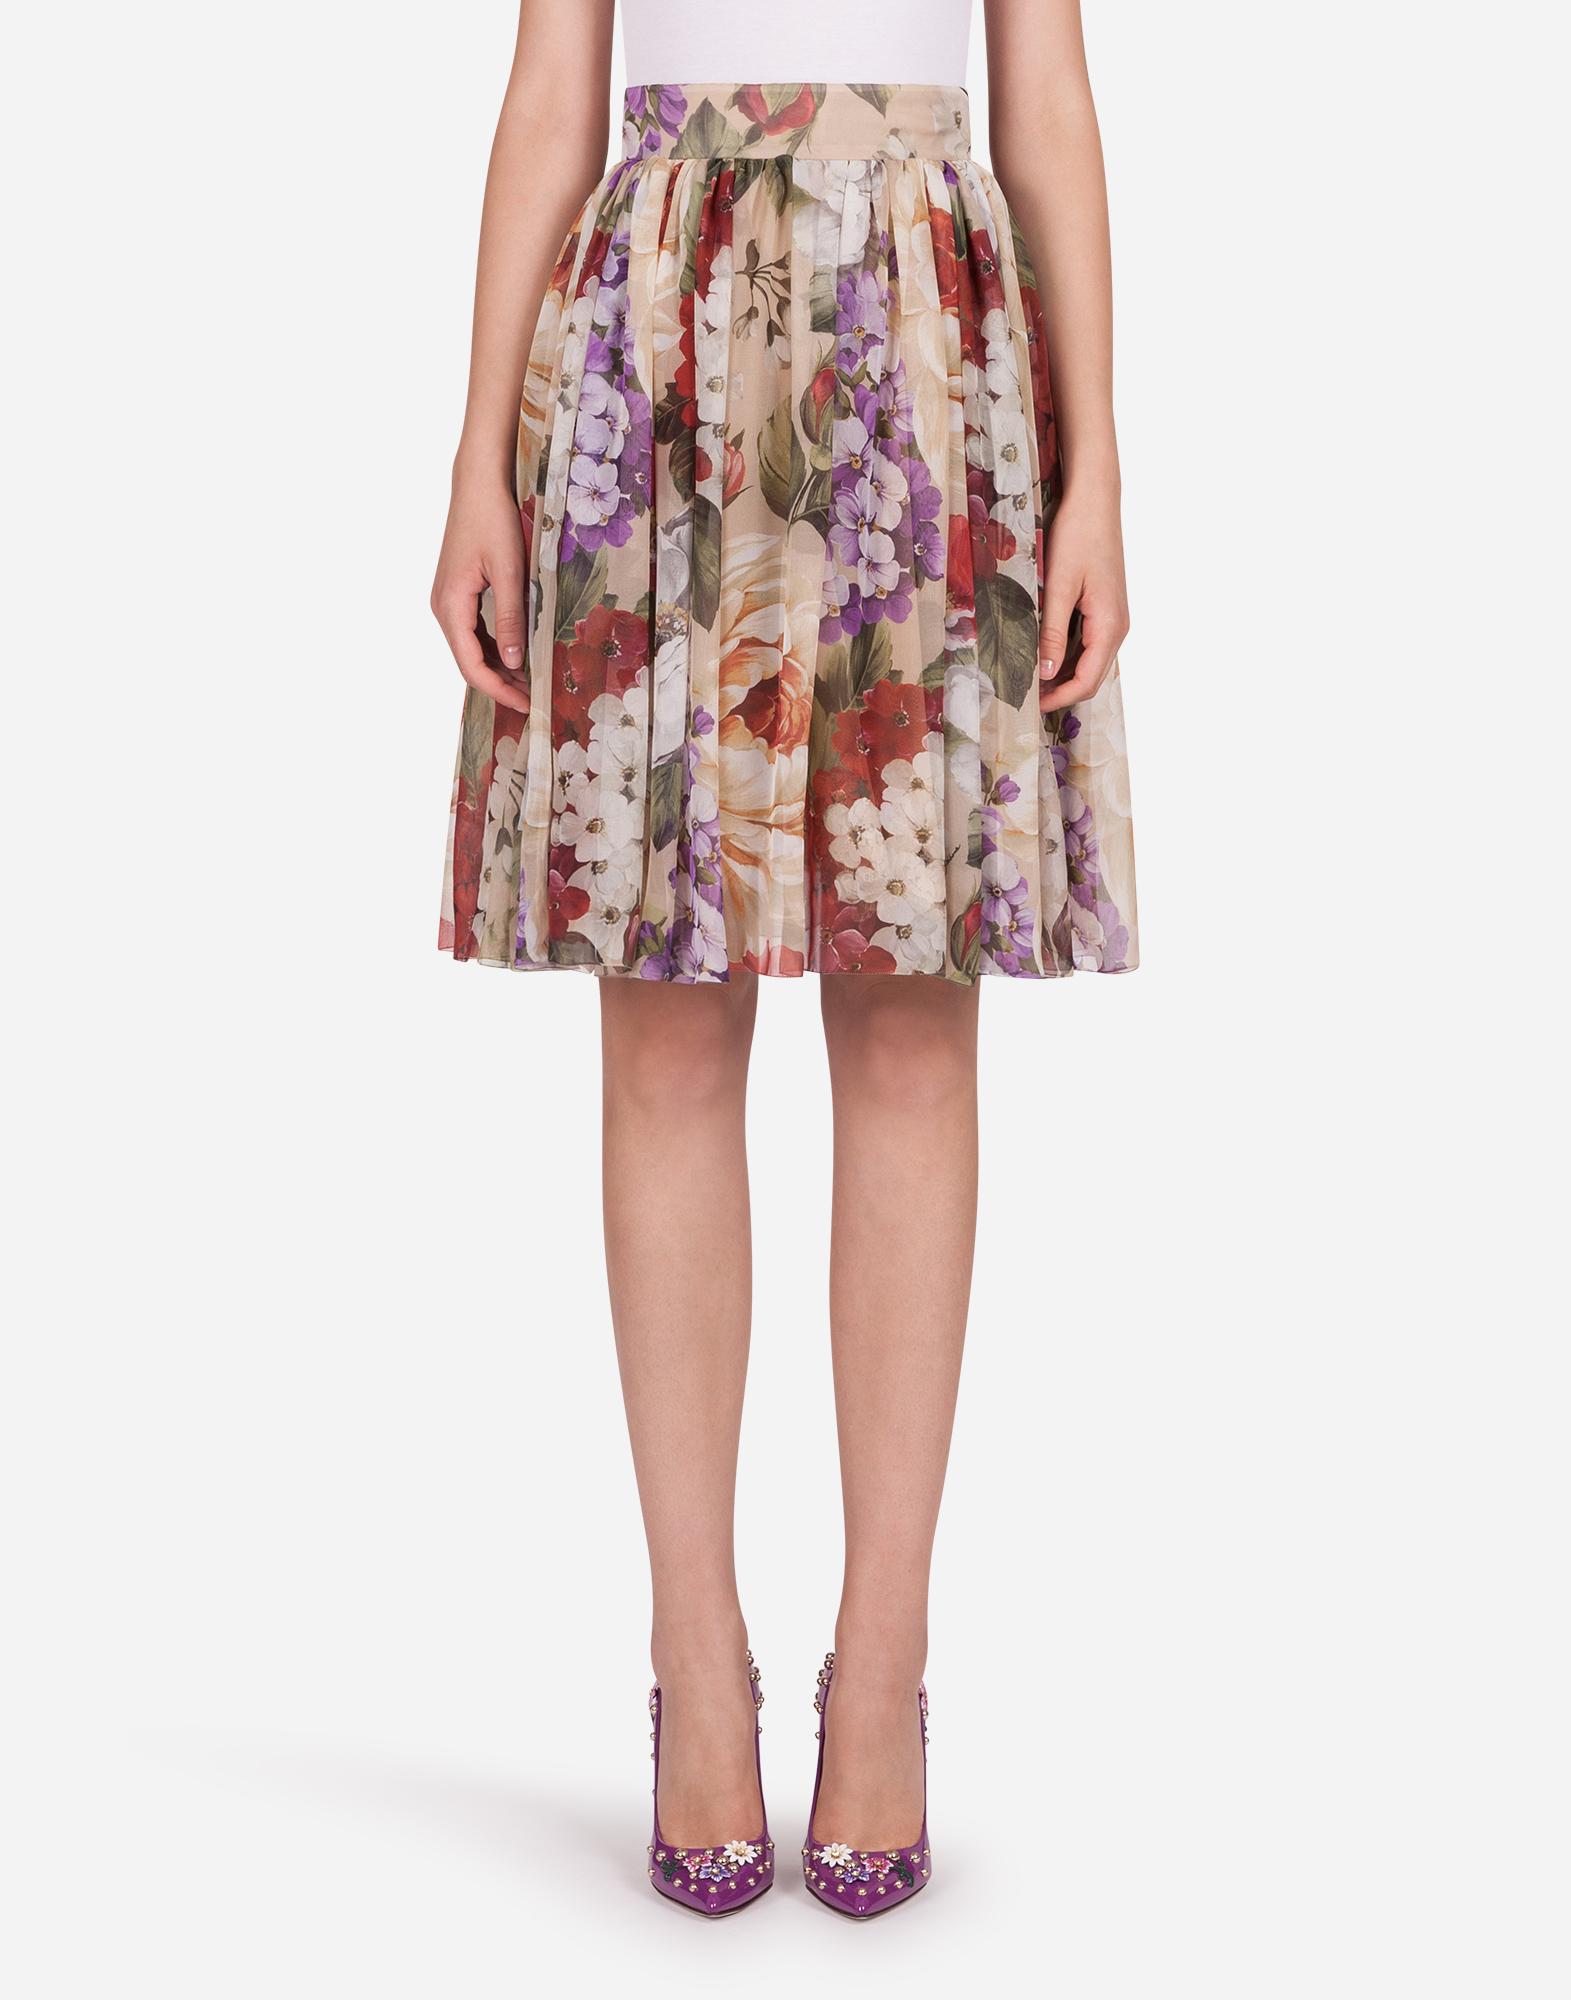 Dolce & Gabbana Floral-print Chiffon Midi Skirt In Floral Print